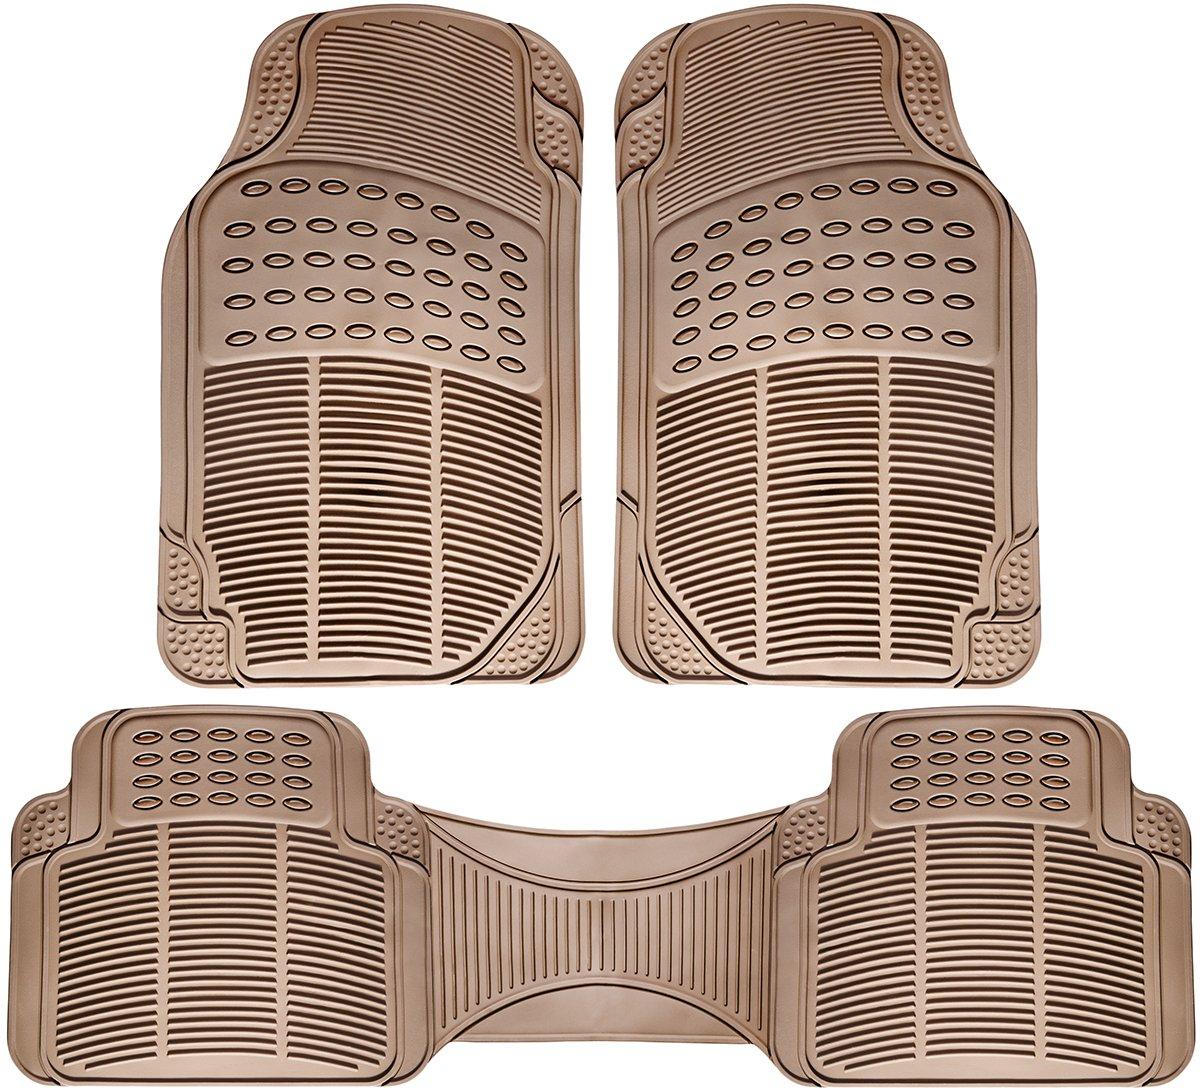 Rubber floor mats denver - Oxgord Universal Fit 3 Piece Full Set Ridged Heavy Duty Rubber Floor Mat Beige